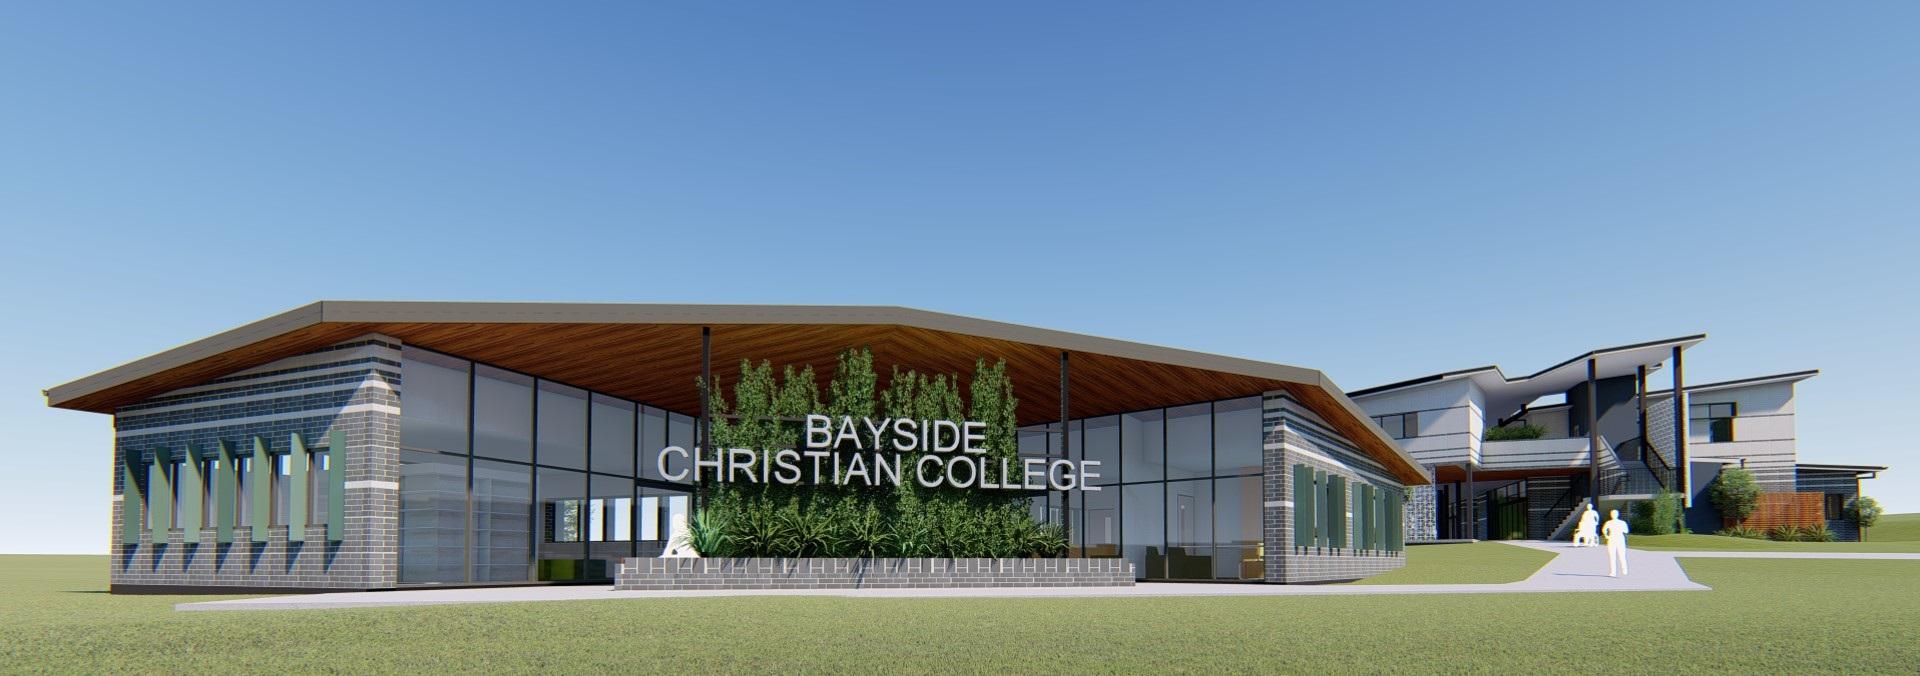 Bayside Christian College_Photo - 1.jpg